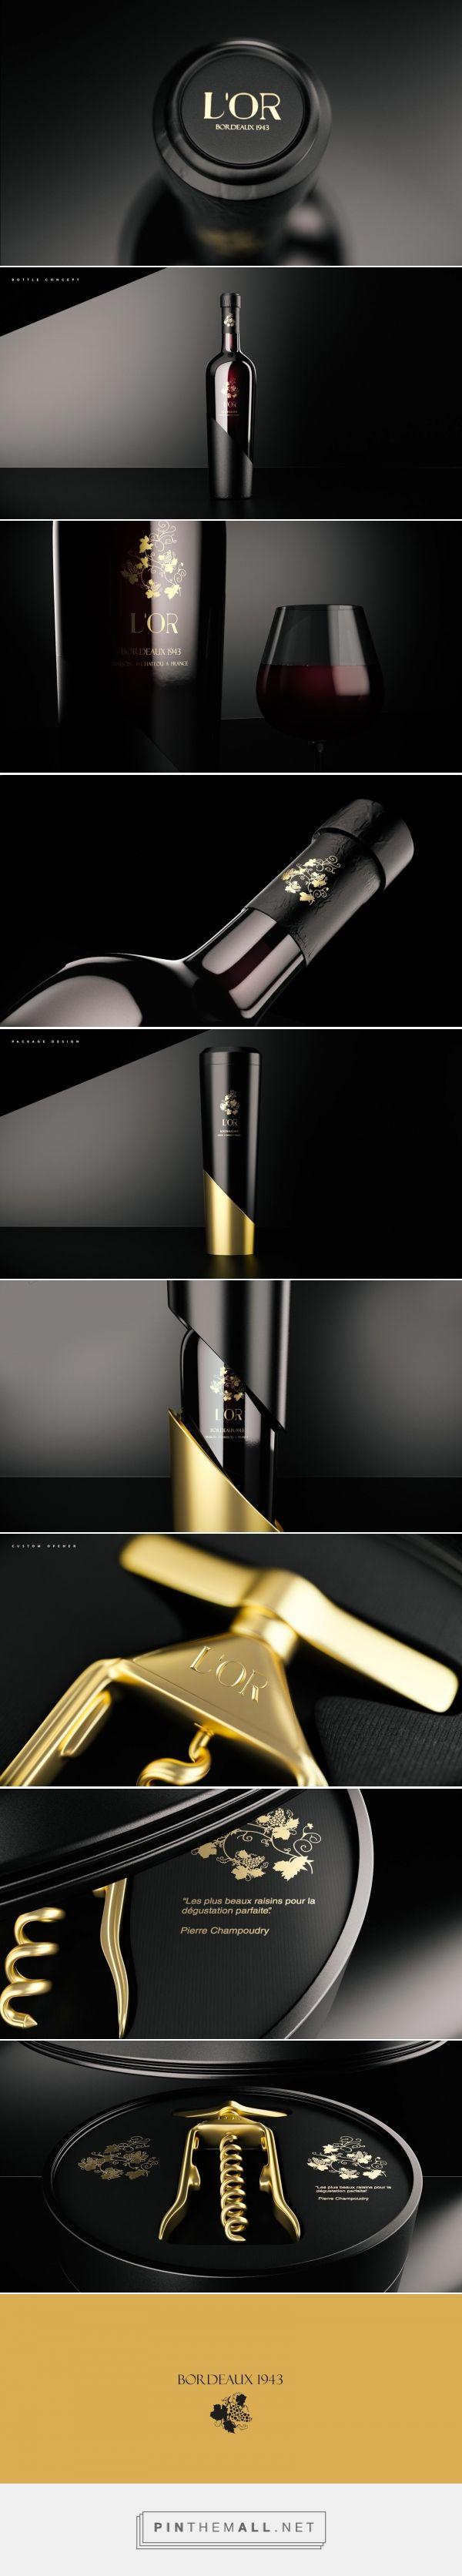 L'OR wine packaging design by 4eFergovi - http://www.packagingoftheworld.com/2016/12/lor.html